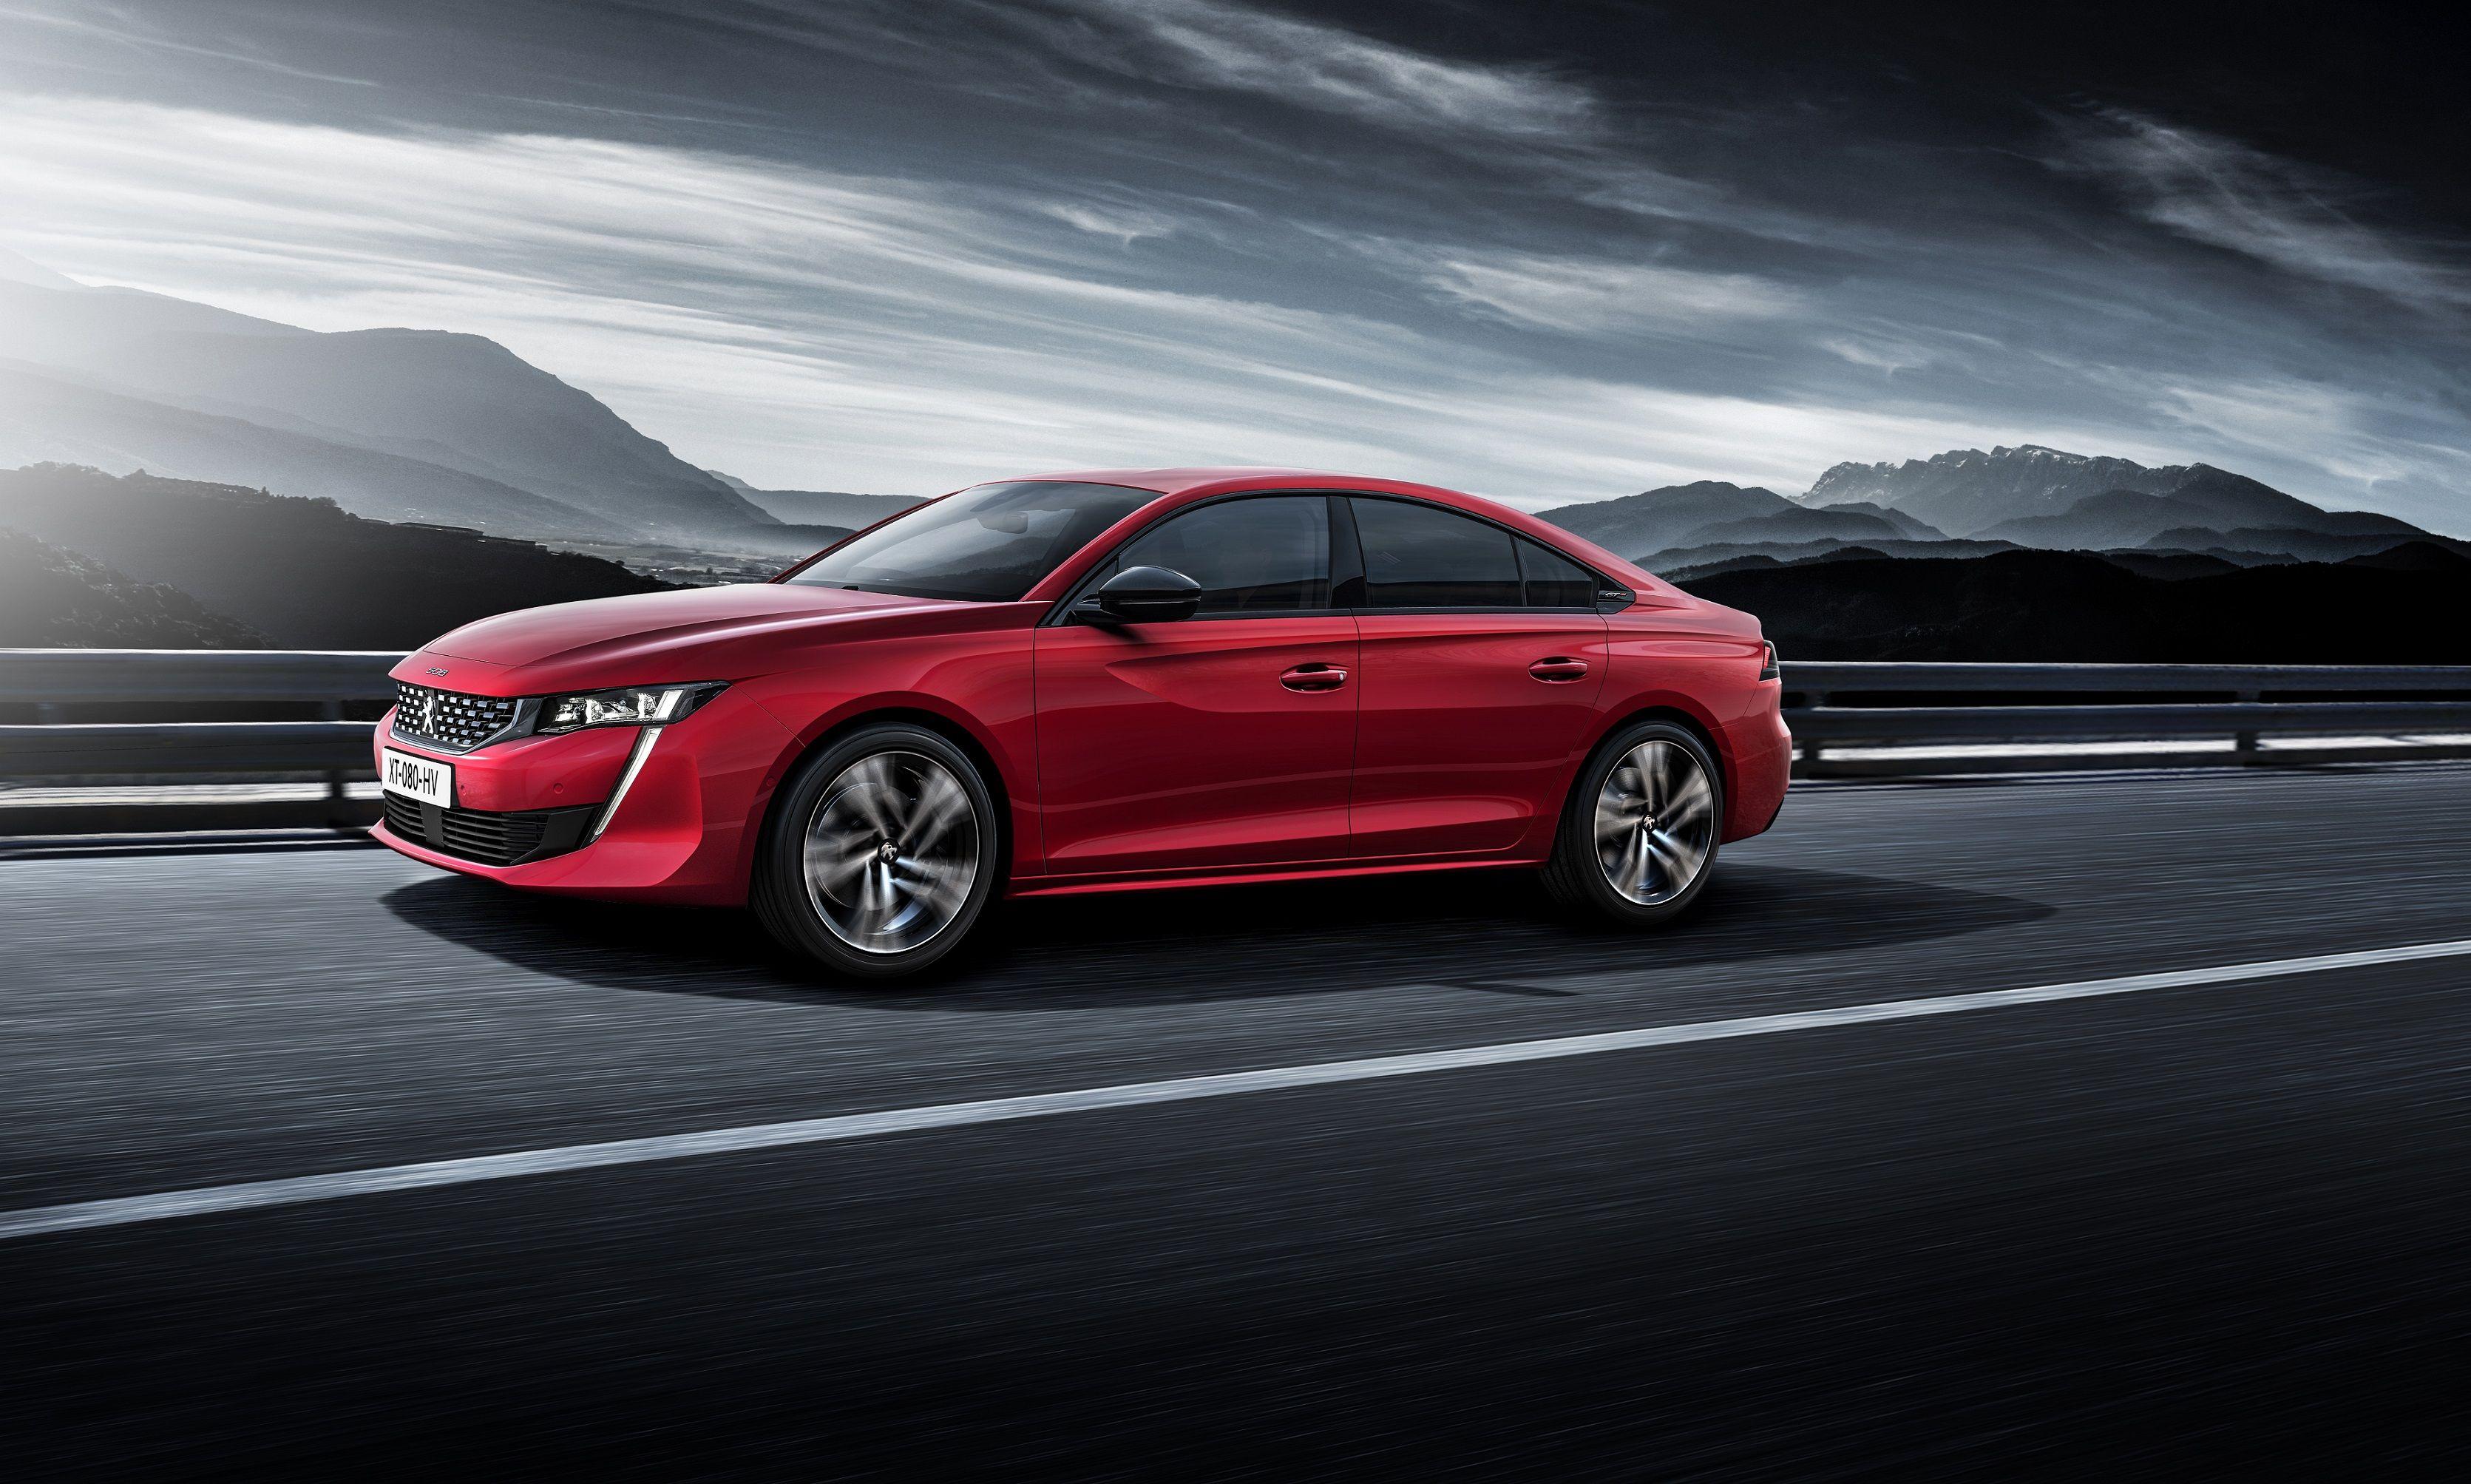 Peugeot presenta tres primicias mundiales en el 88º Salón Internacional del Automóvil de Ginebra